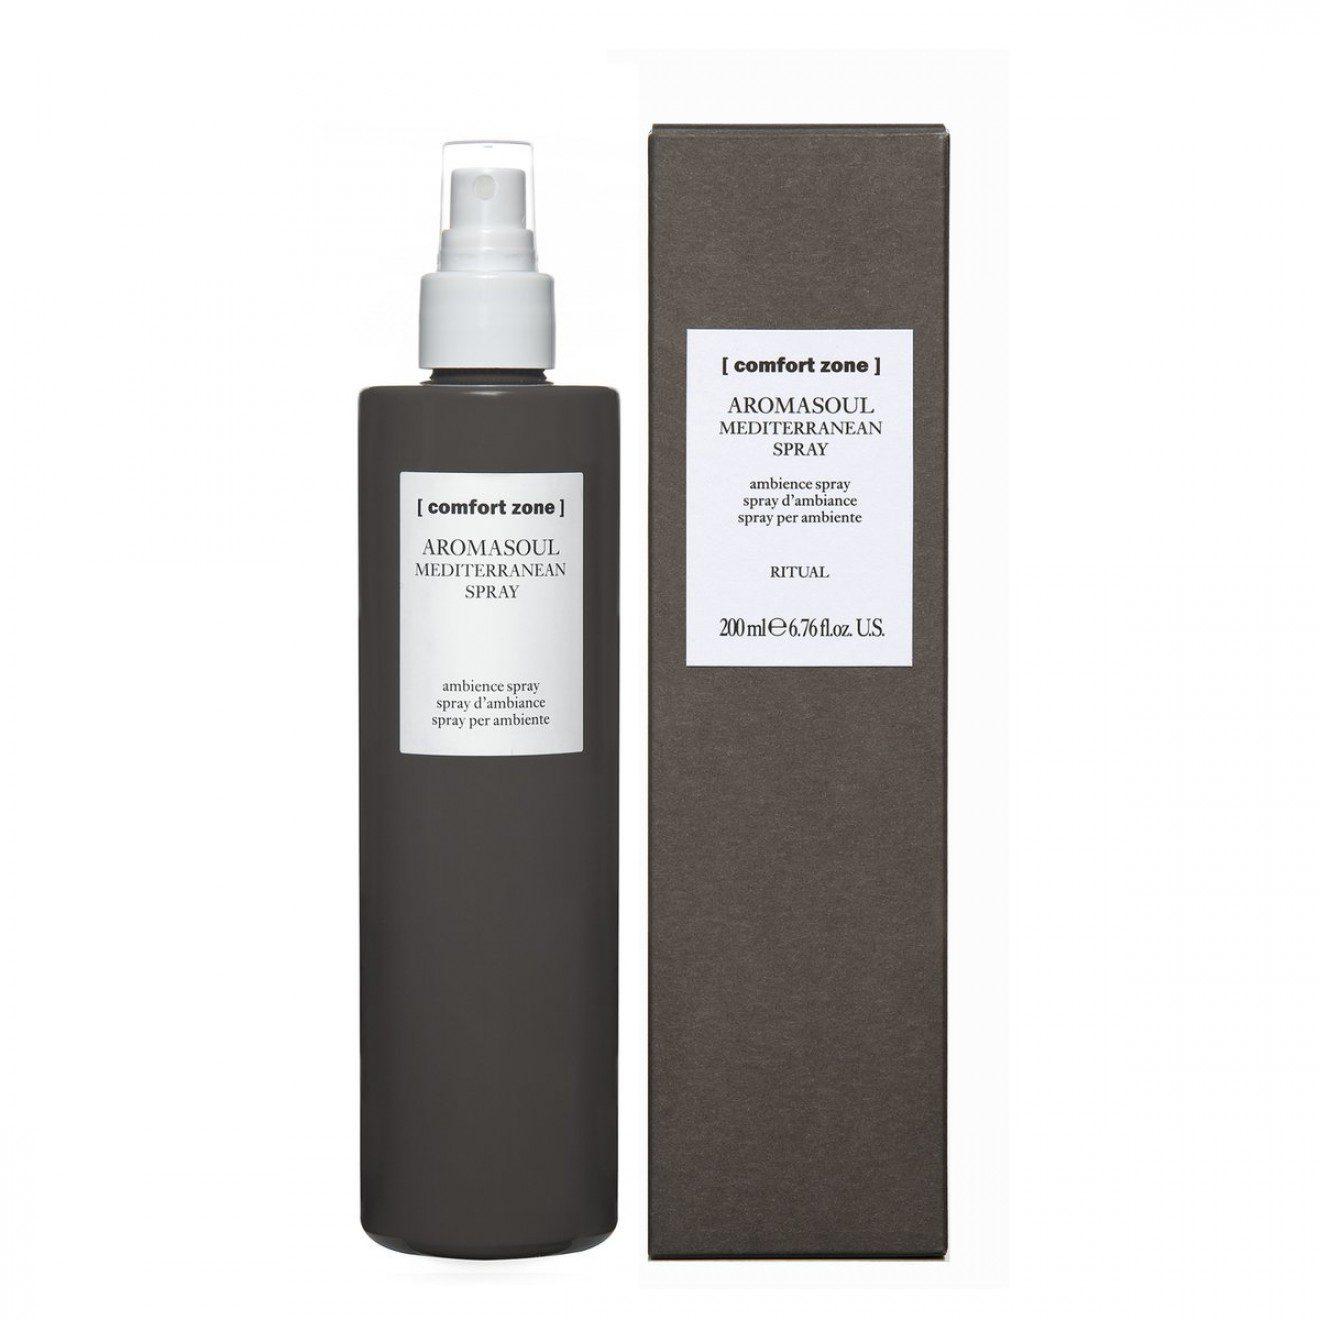 Aromasoul-Mediterranean-Spray